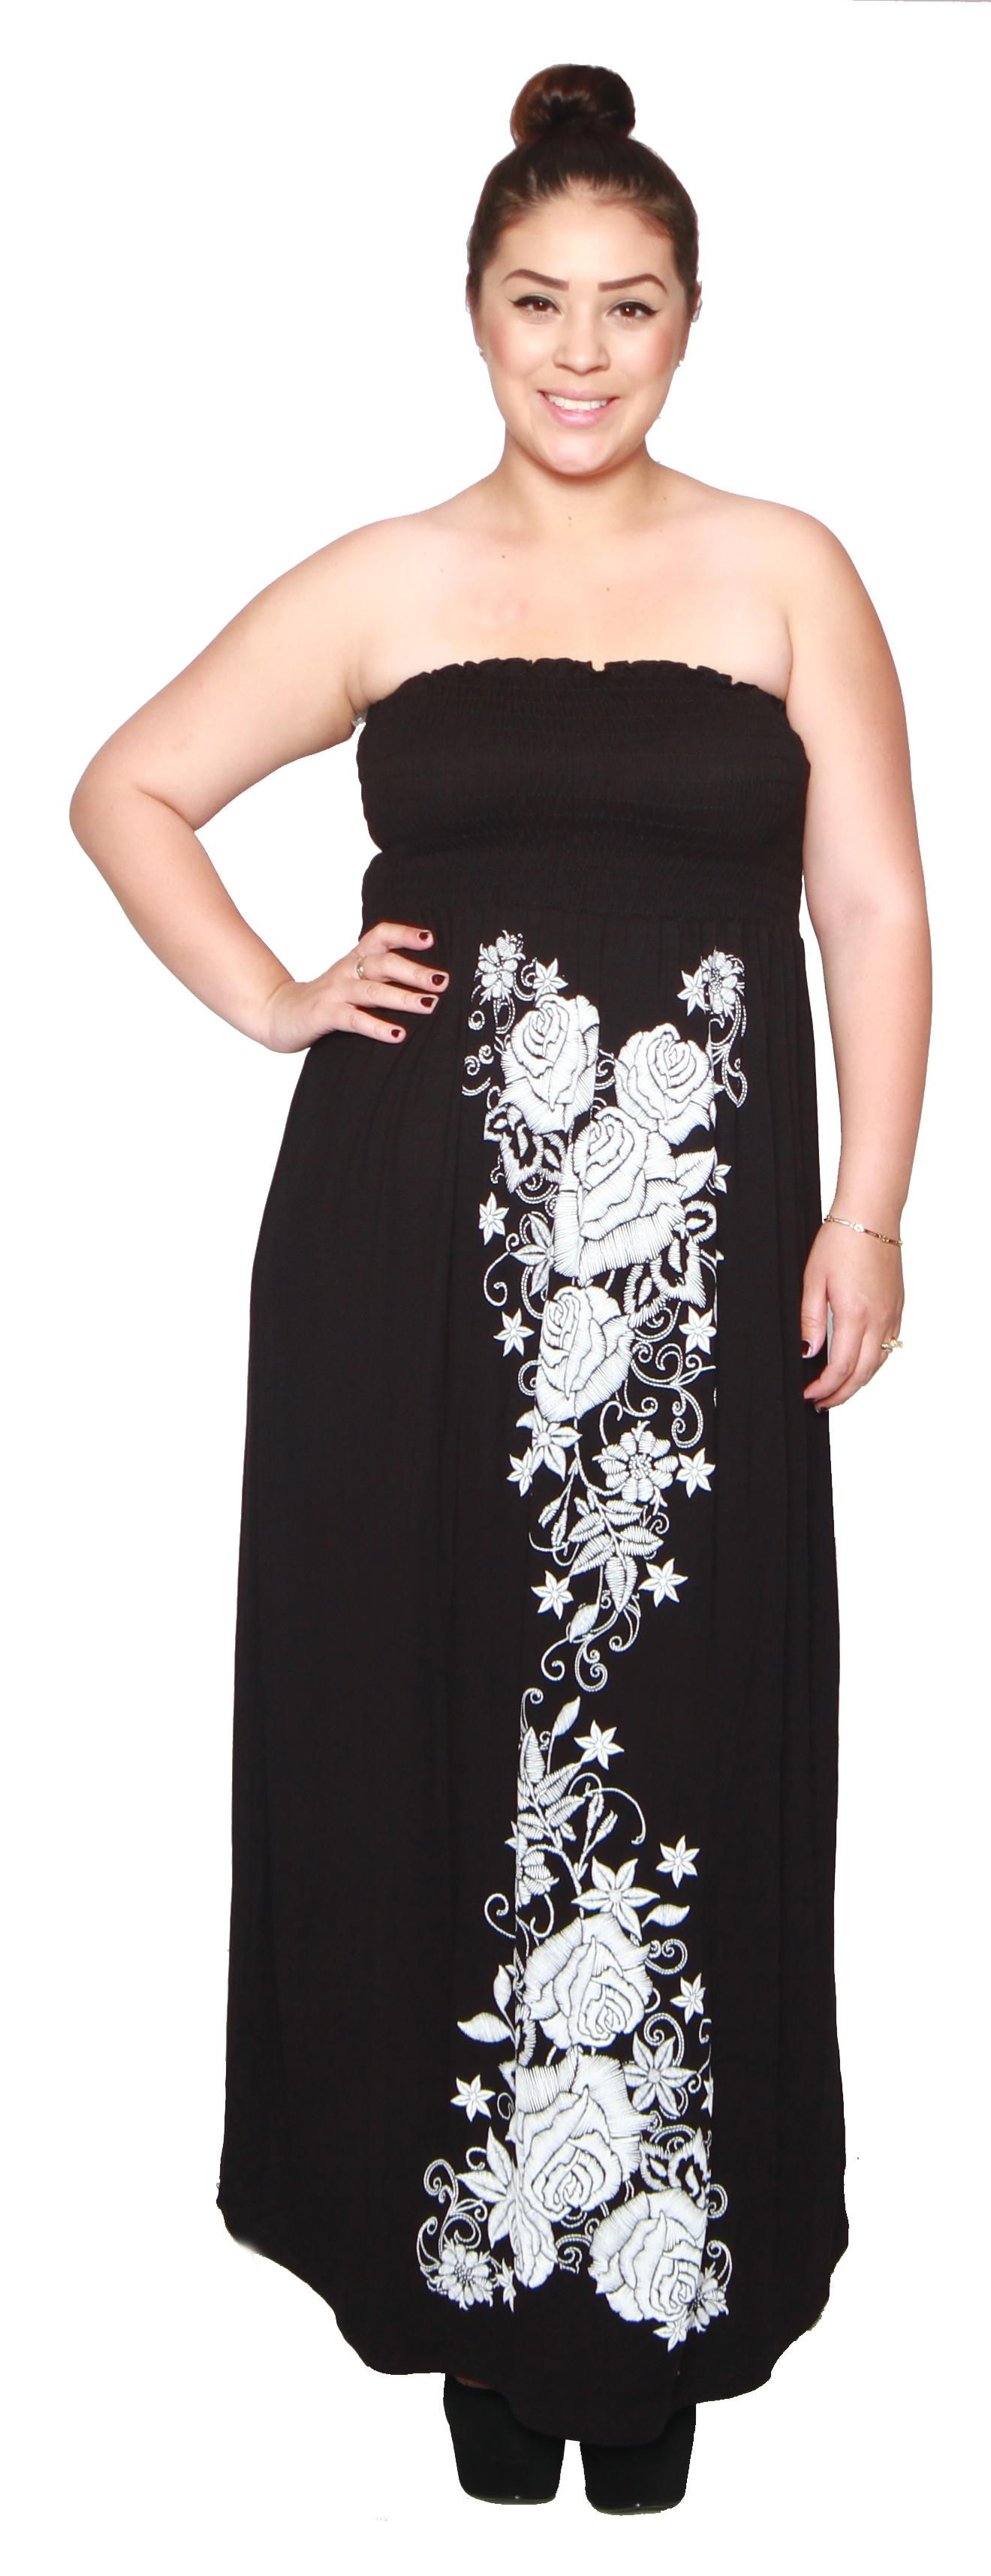 TiffsPixieDust Junior Plus Size Womens Maxi Dress Review